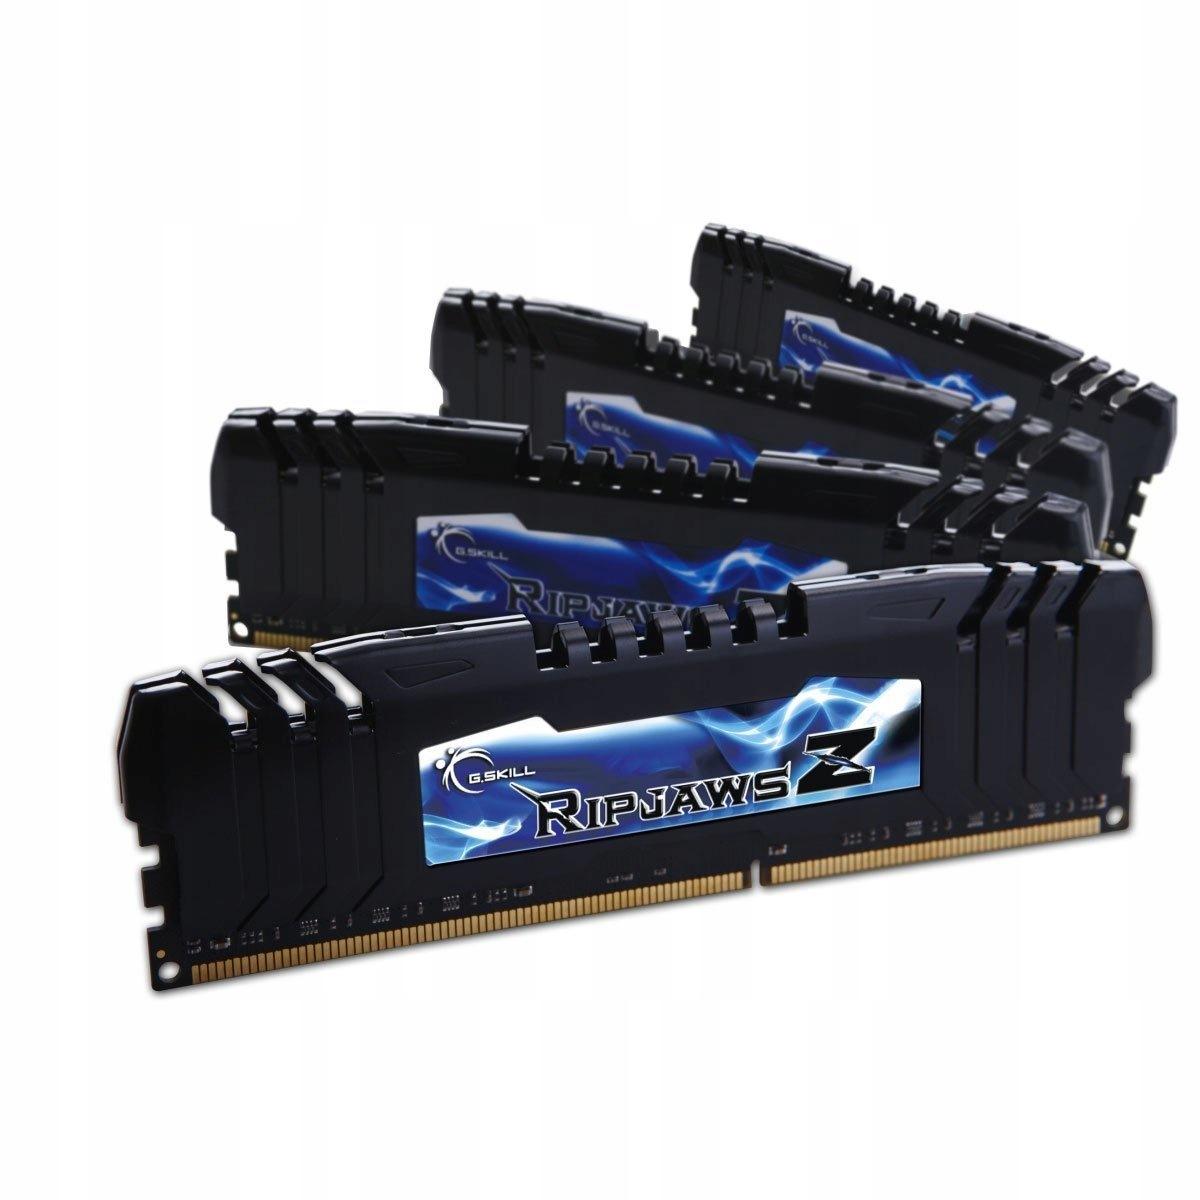 G.SKILL DDR3 RIPJAWSZ 4x4GB 2133MHz CL9 XMP